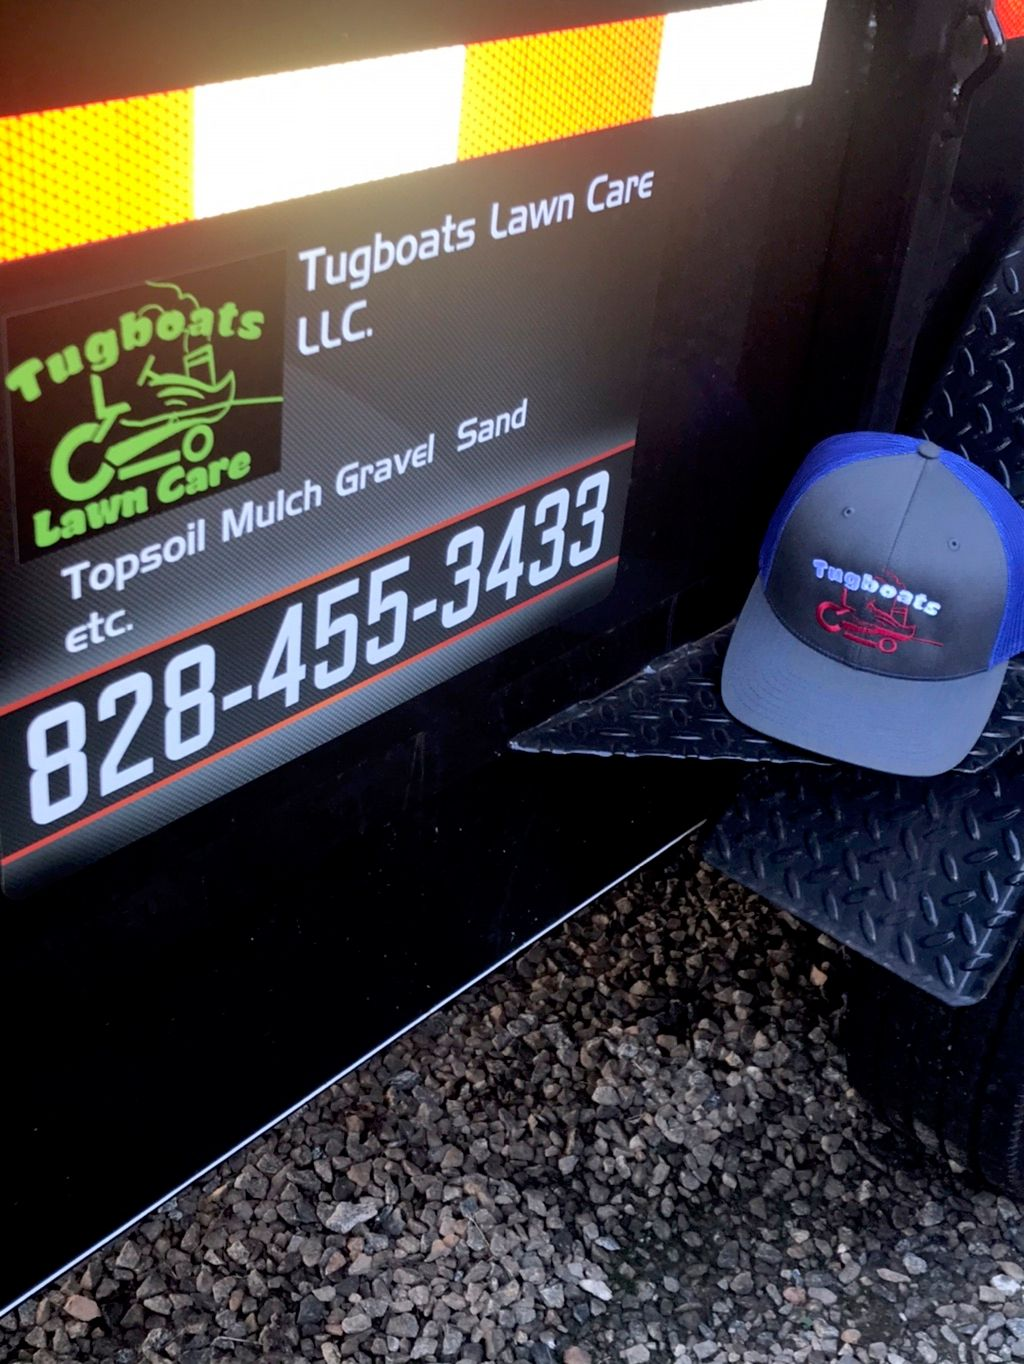 Tugboats Lawn Care LLC